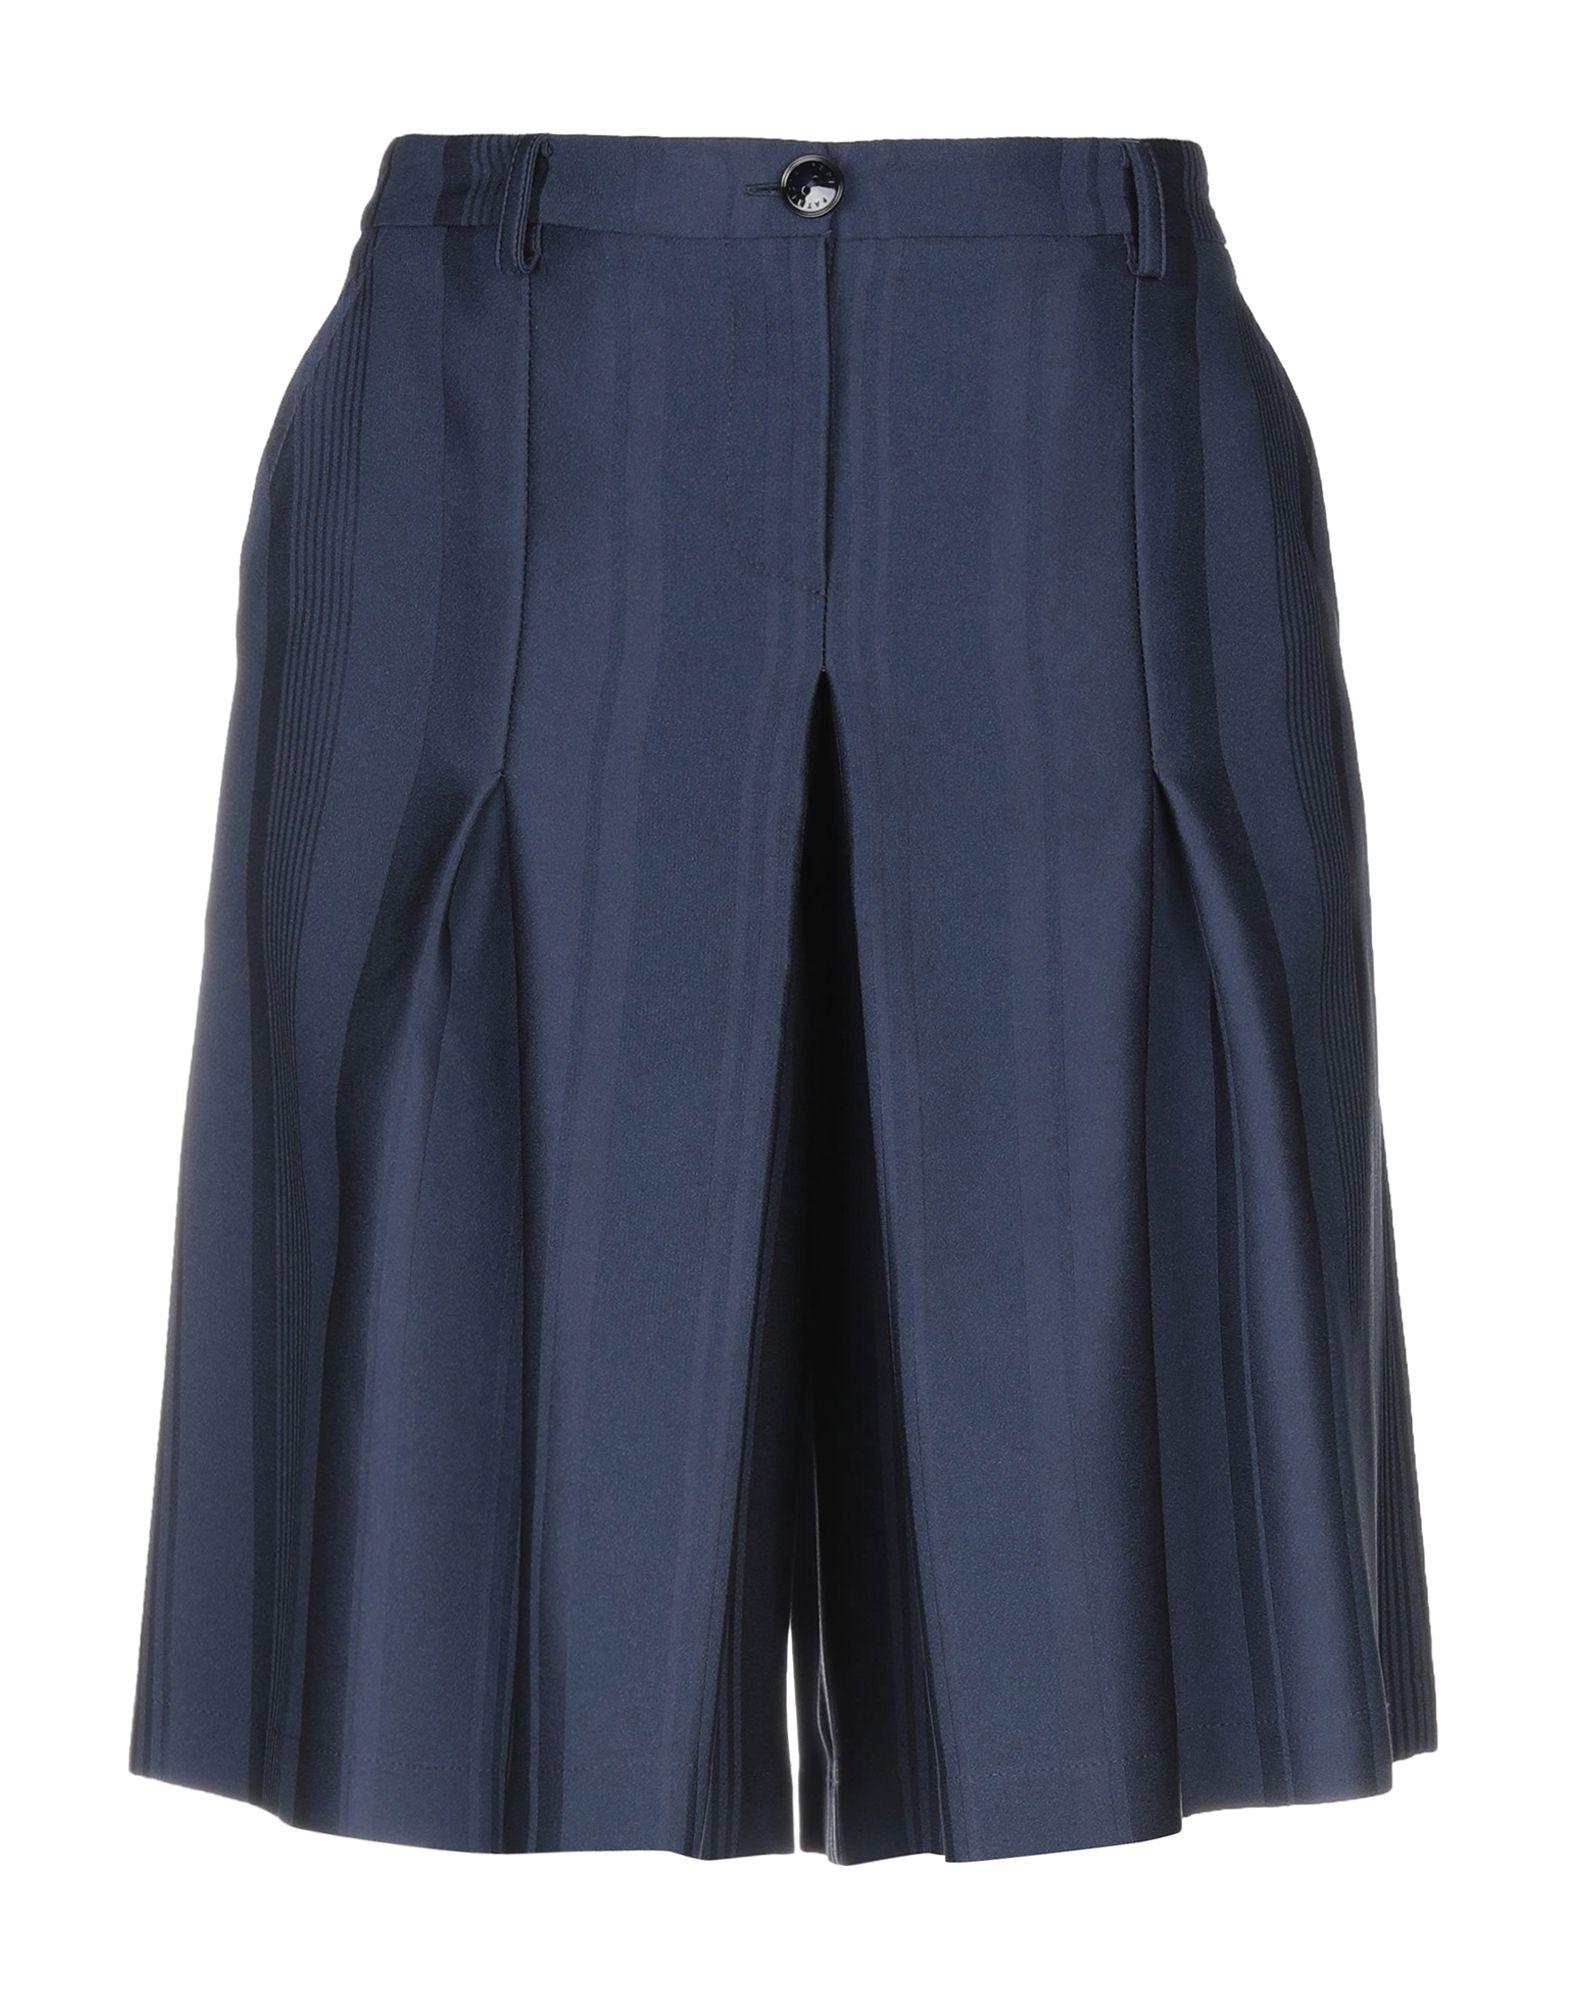 PATRIZIA PEPE Бермуды patrizia pepe широкие джинсы